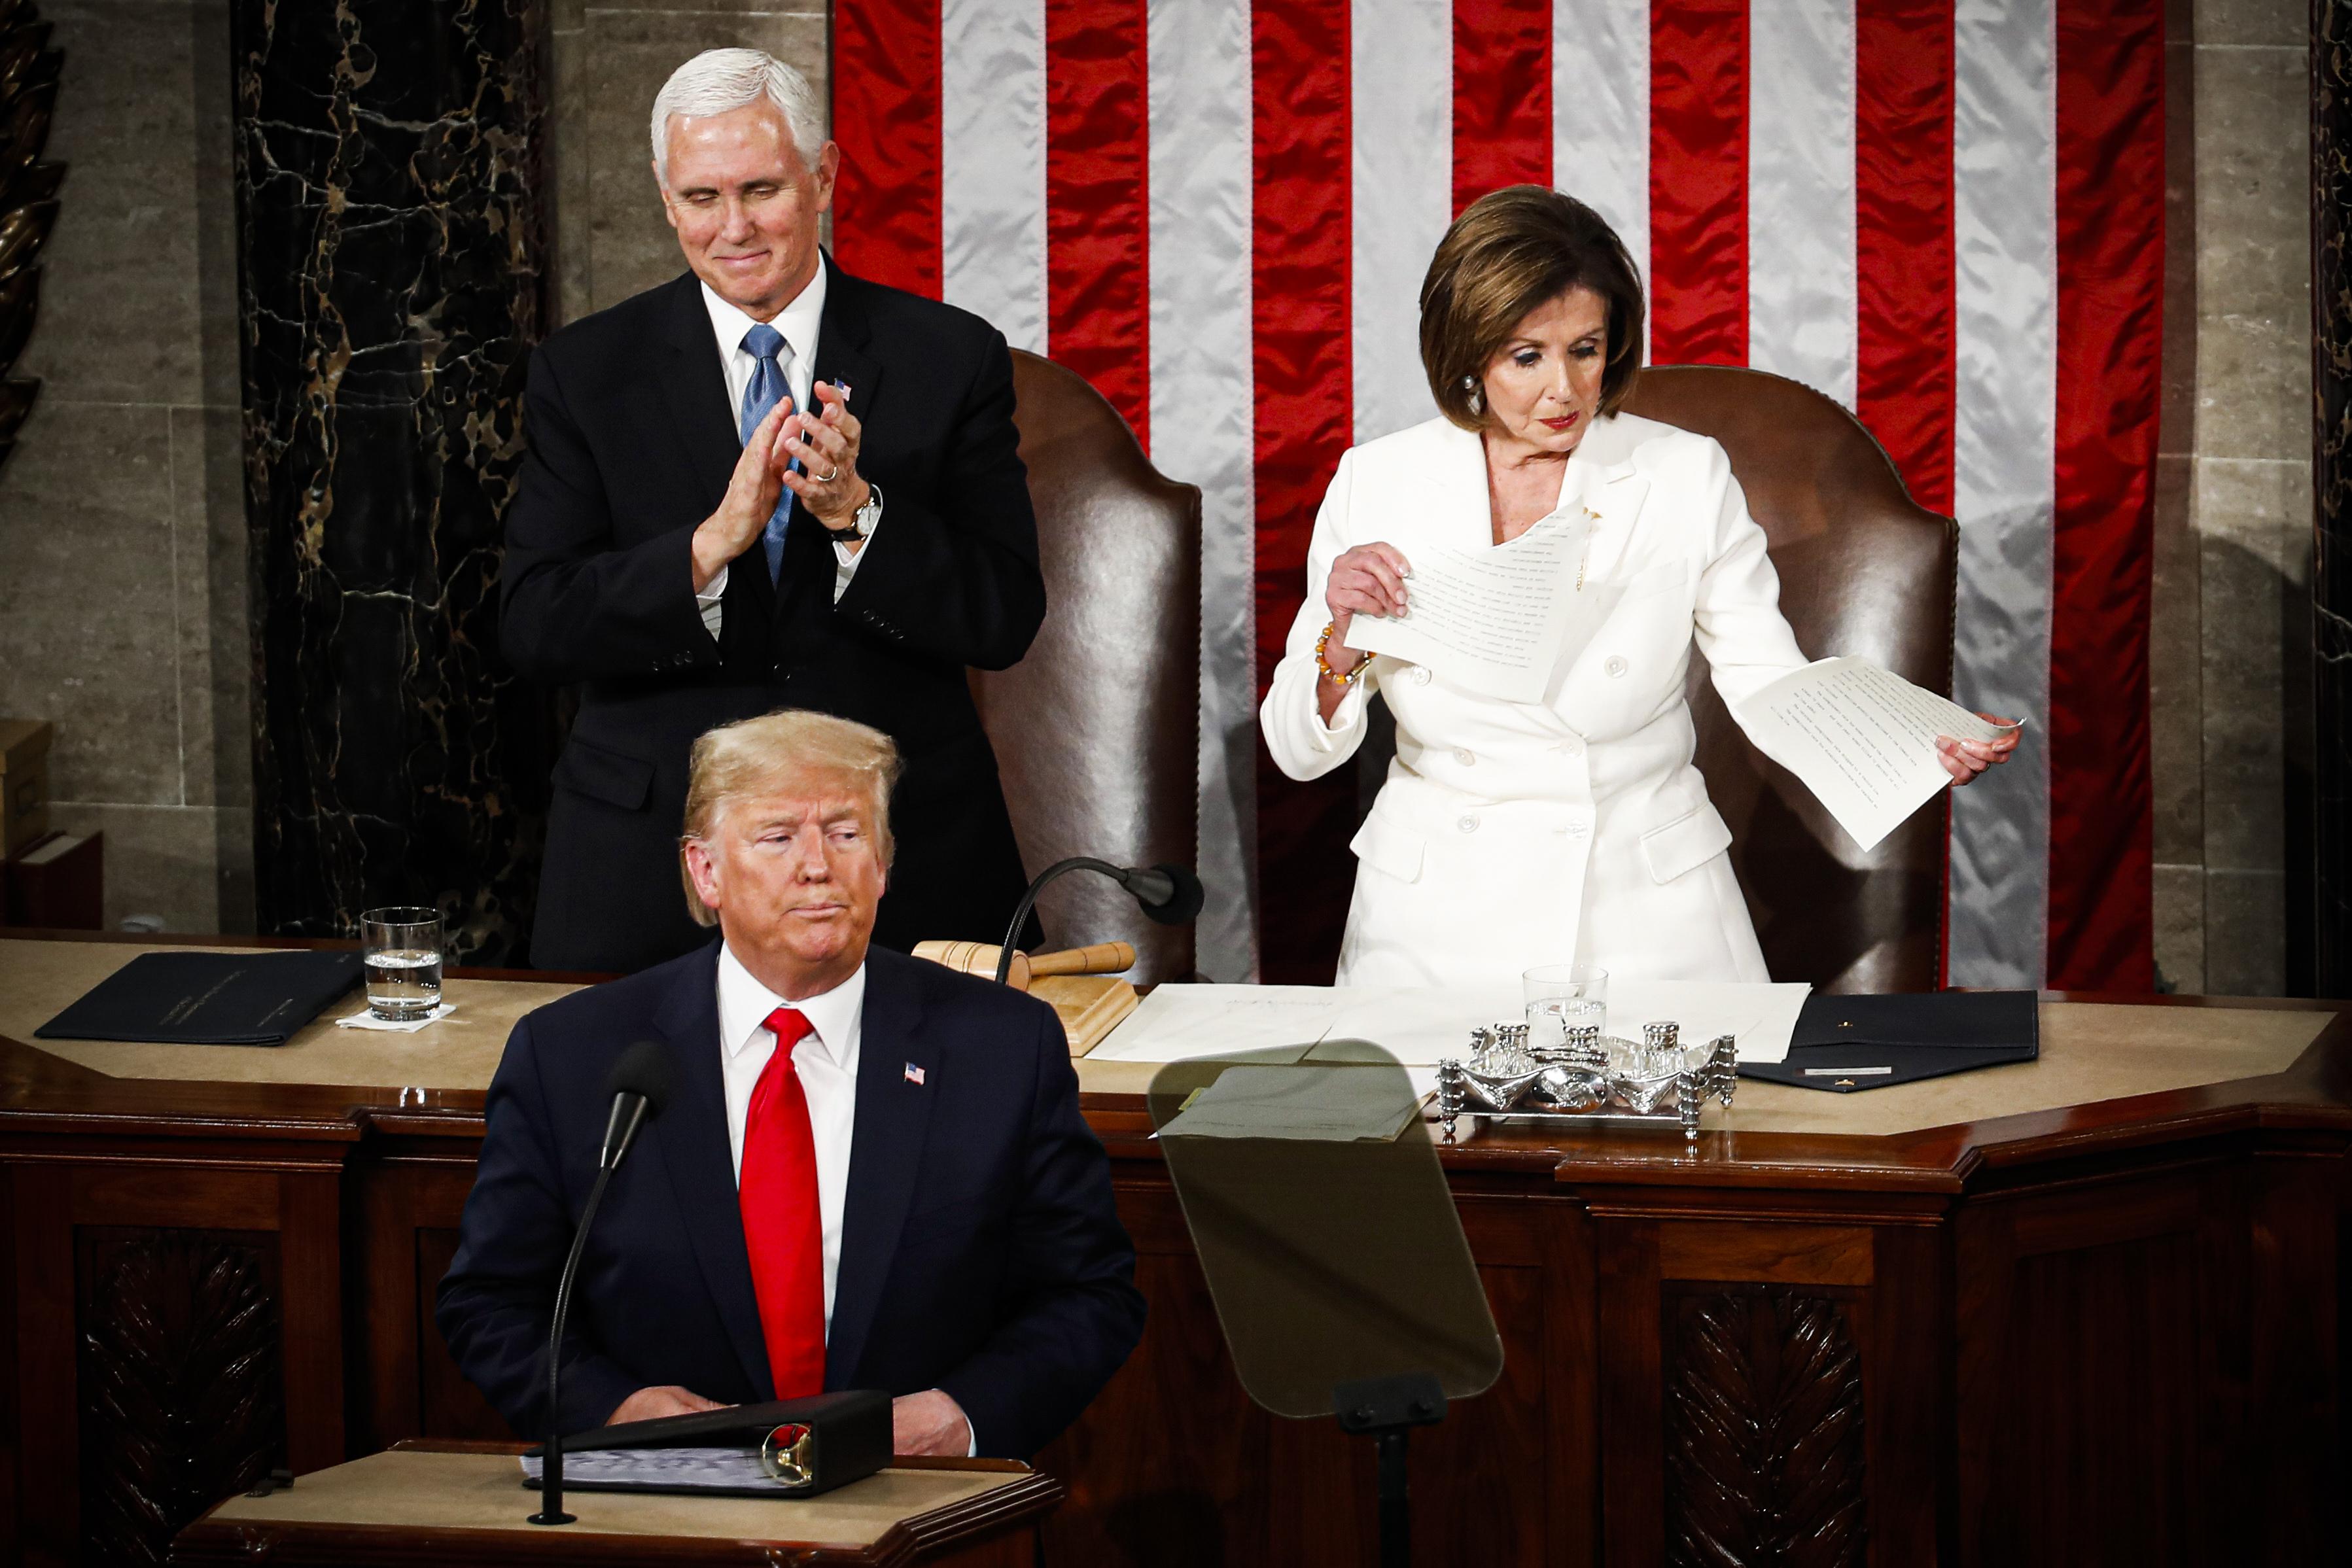 Pelosi's State of the Union response: Rip up Trump's speech